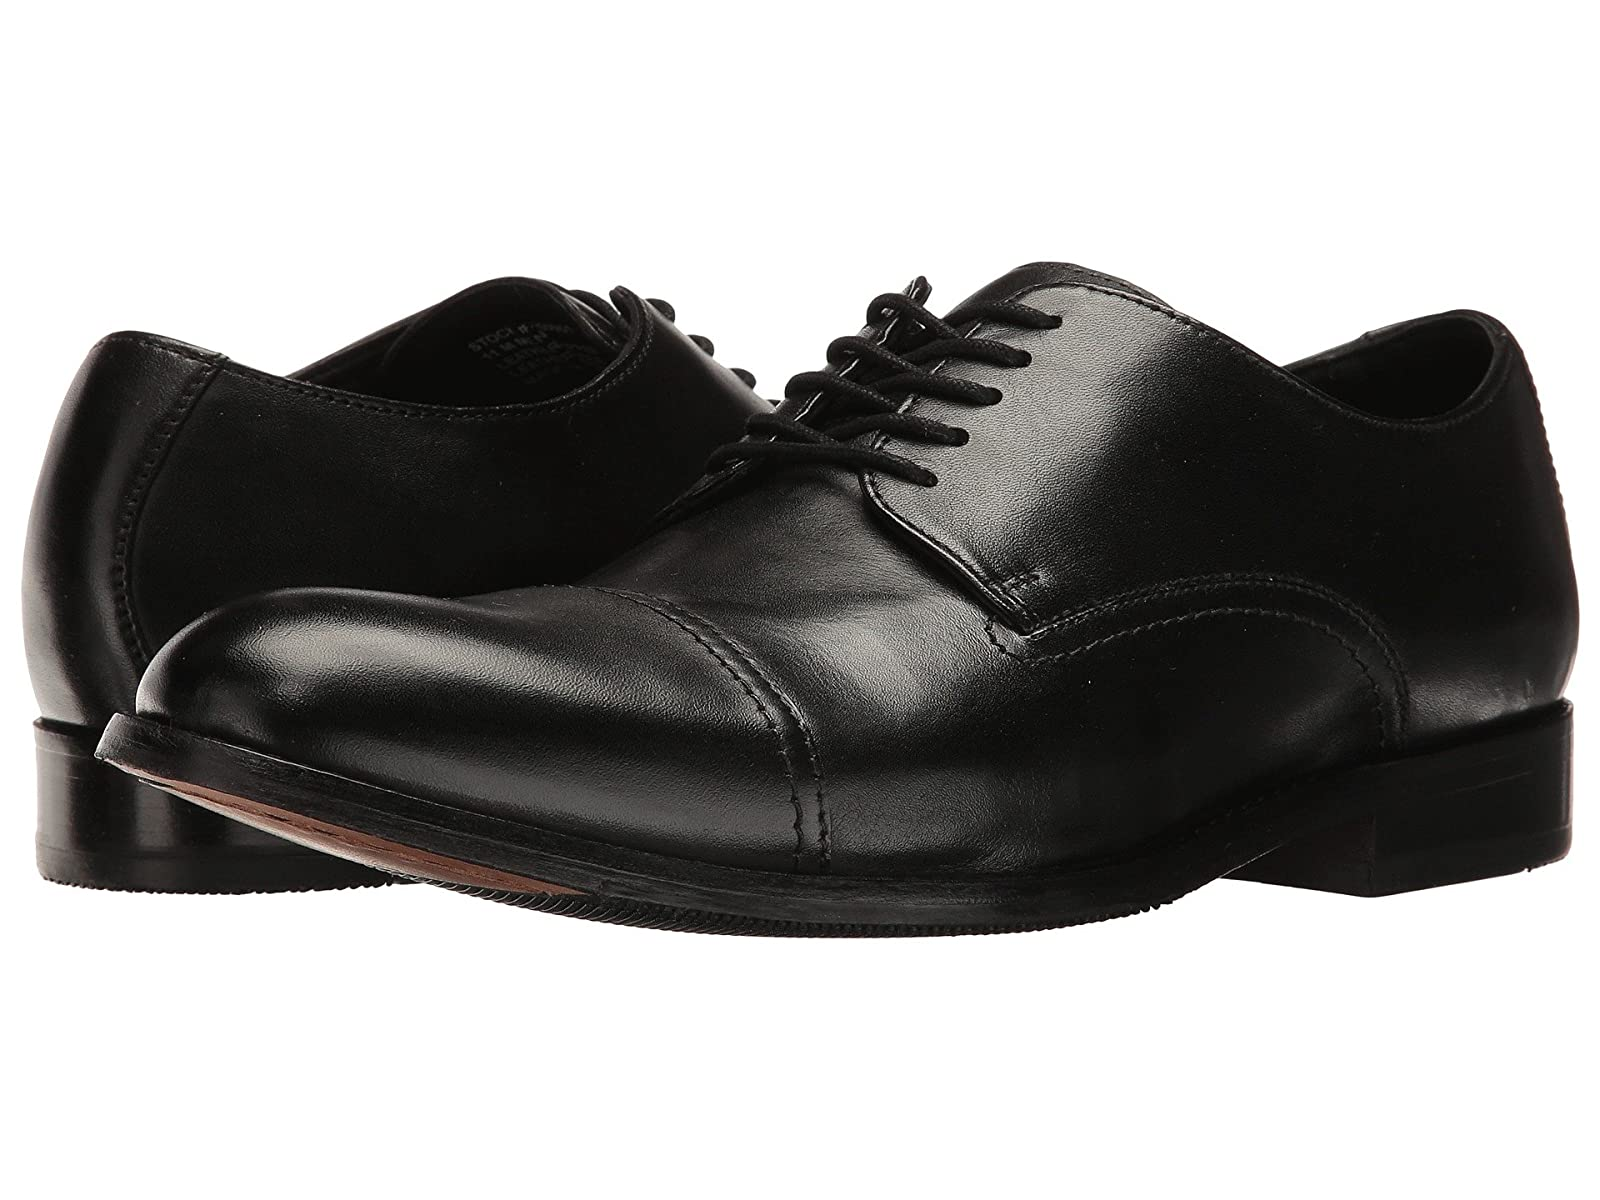 Giorgio Brutini RenzoCheap and distinctive eye-catching shoes